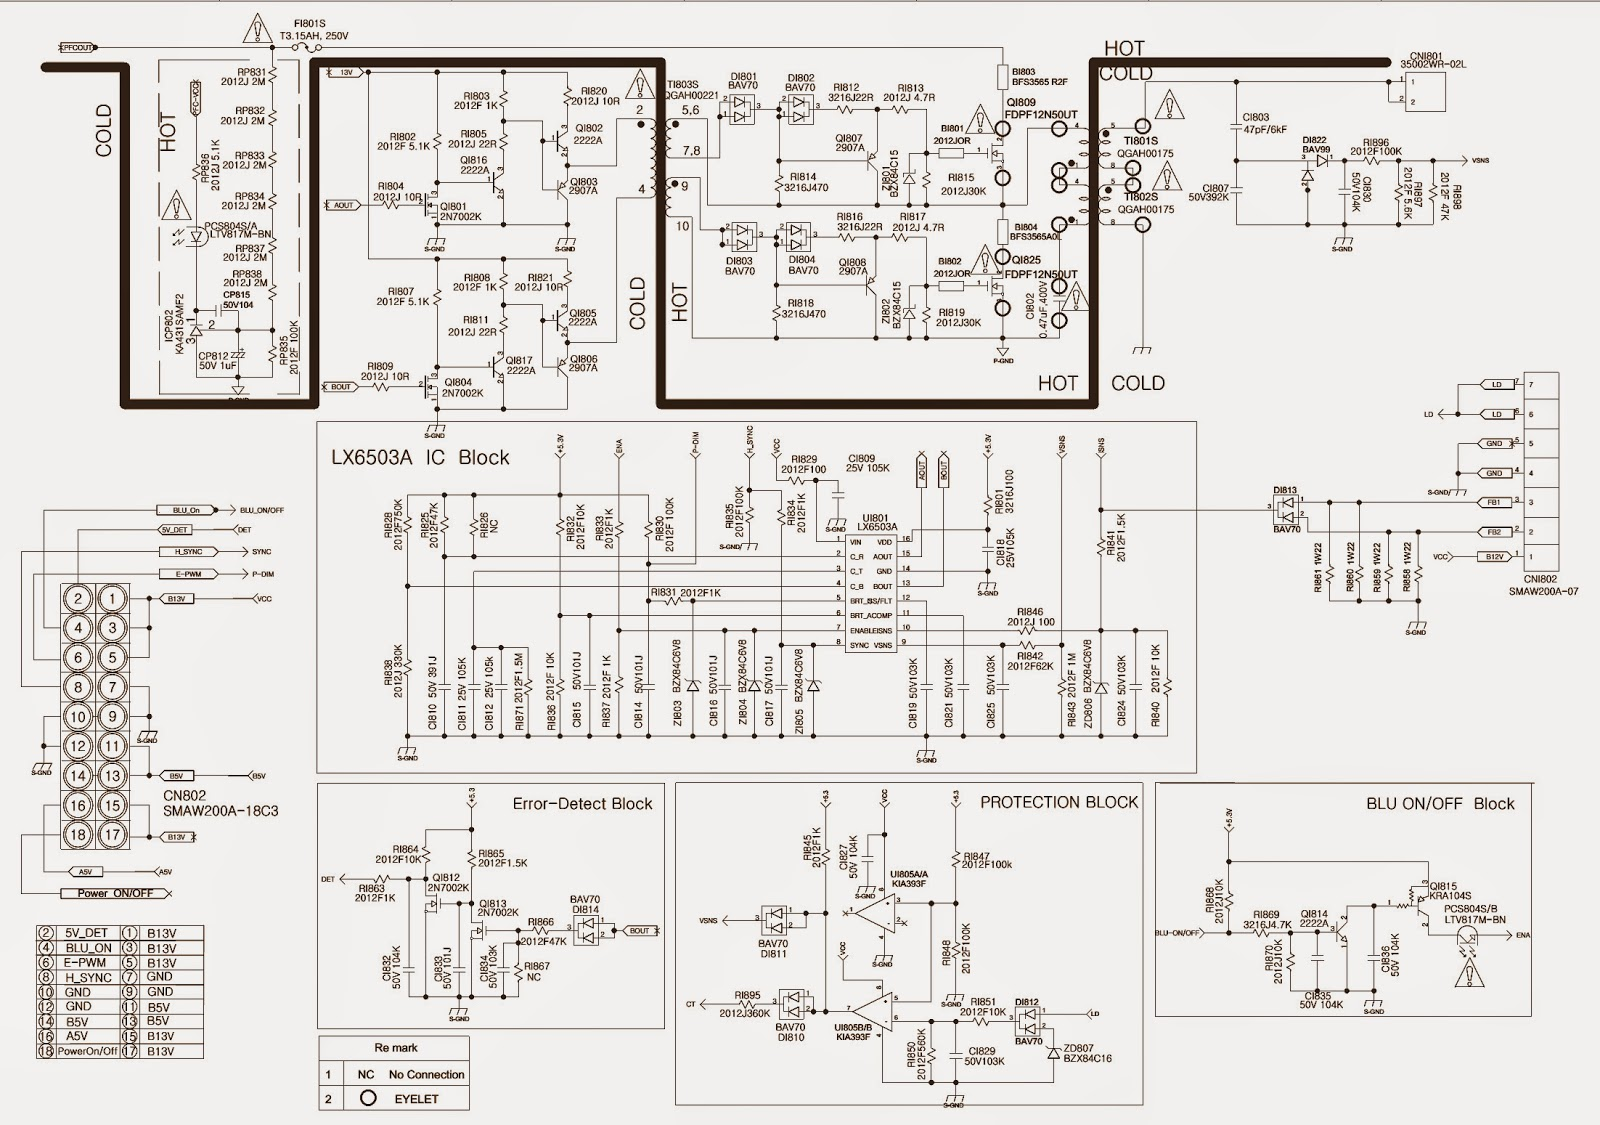 coolmax power supply tester manual